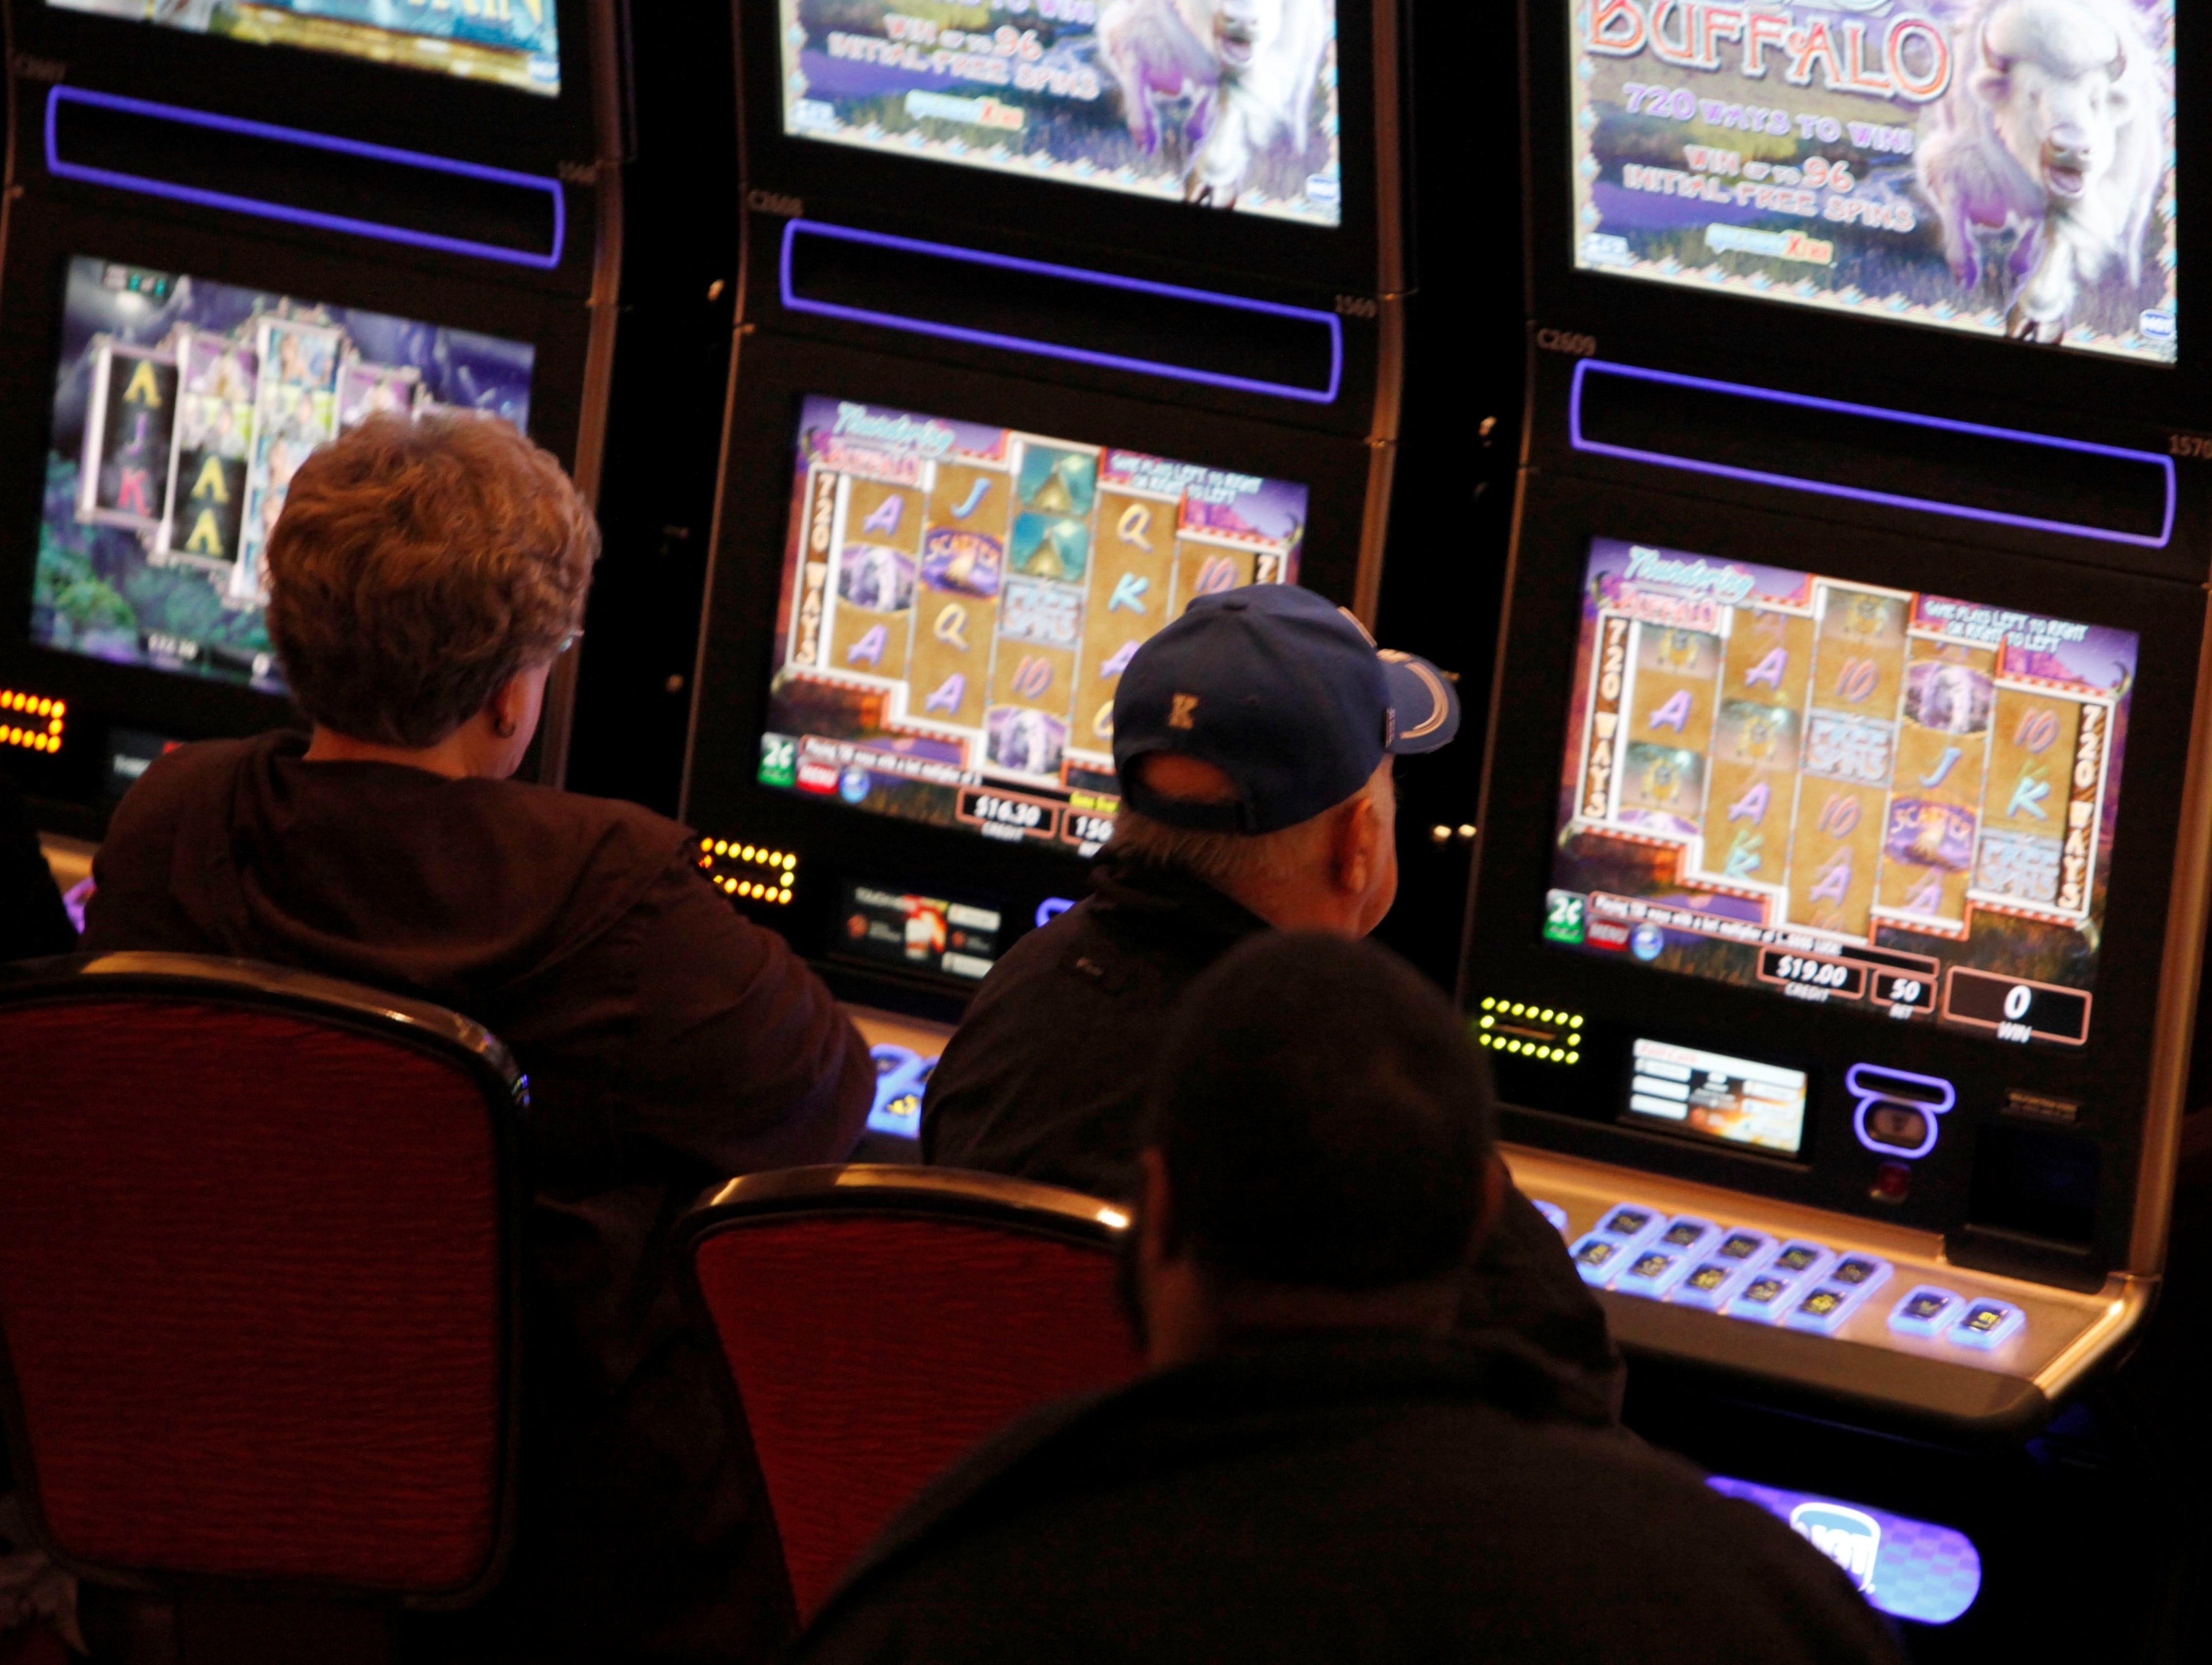 History casino gambling ohio songs about poker or gambling